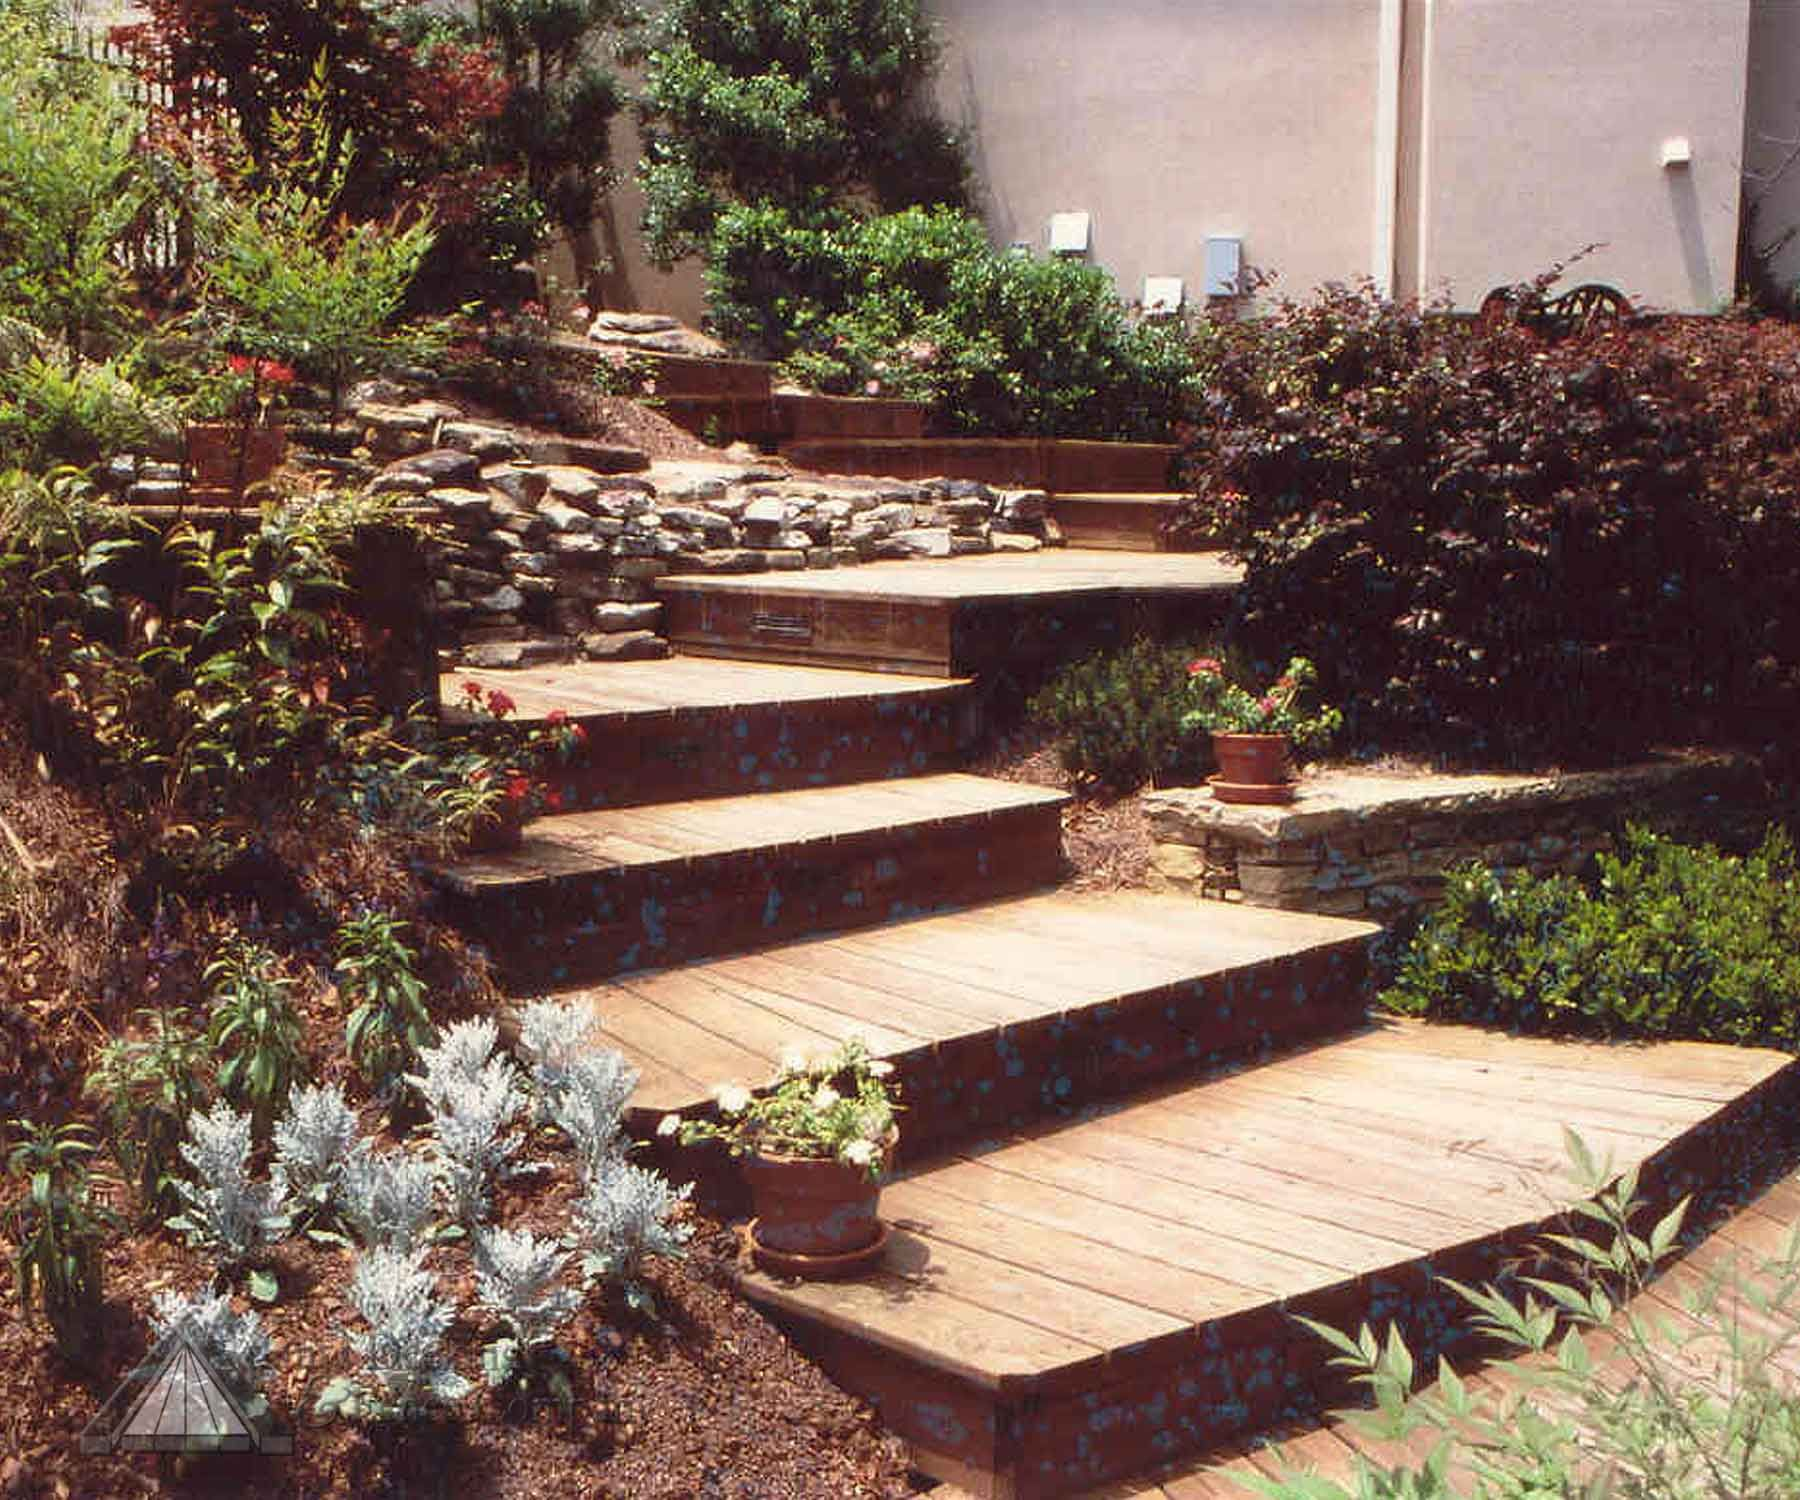 Atlanta Landscaping Portfolio: Wood Boardwalk And Steps From